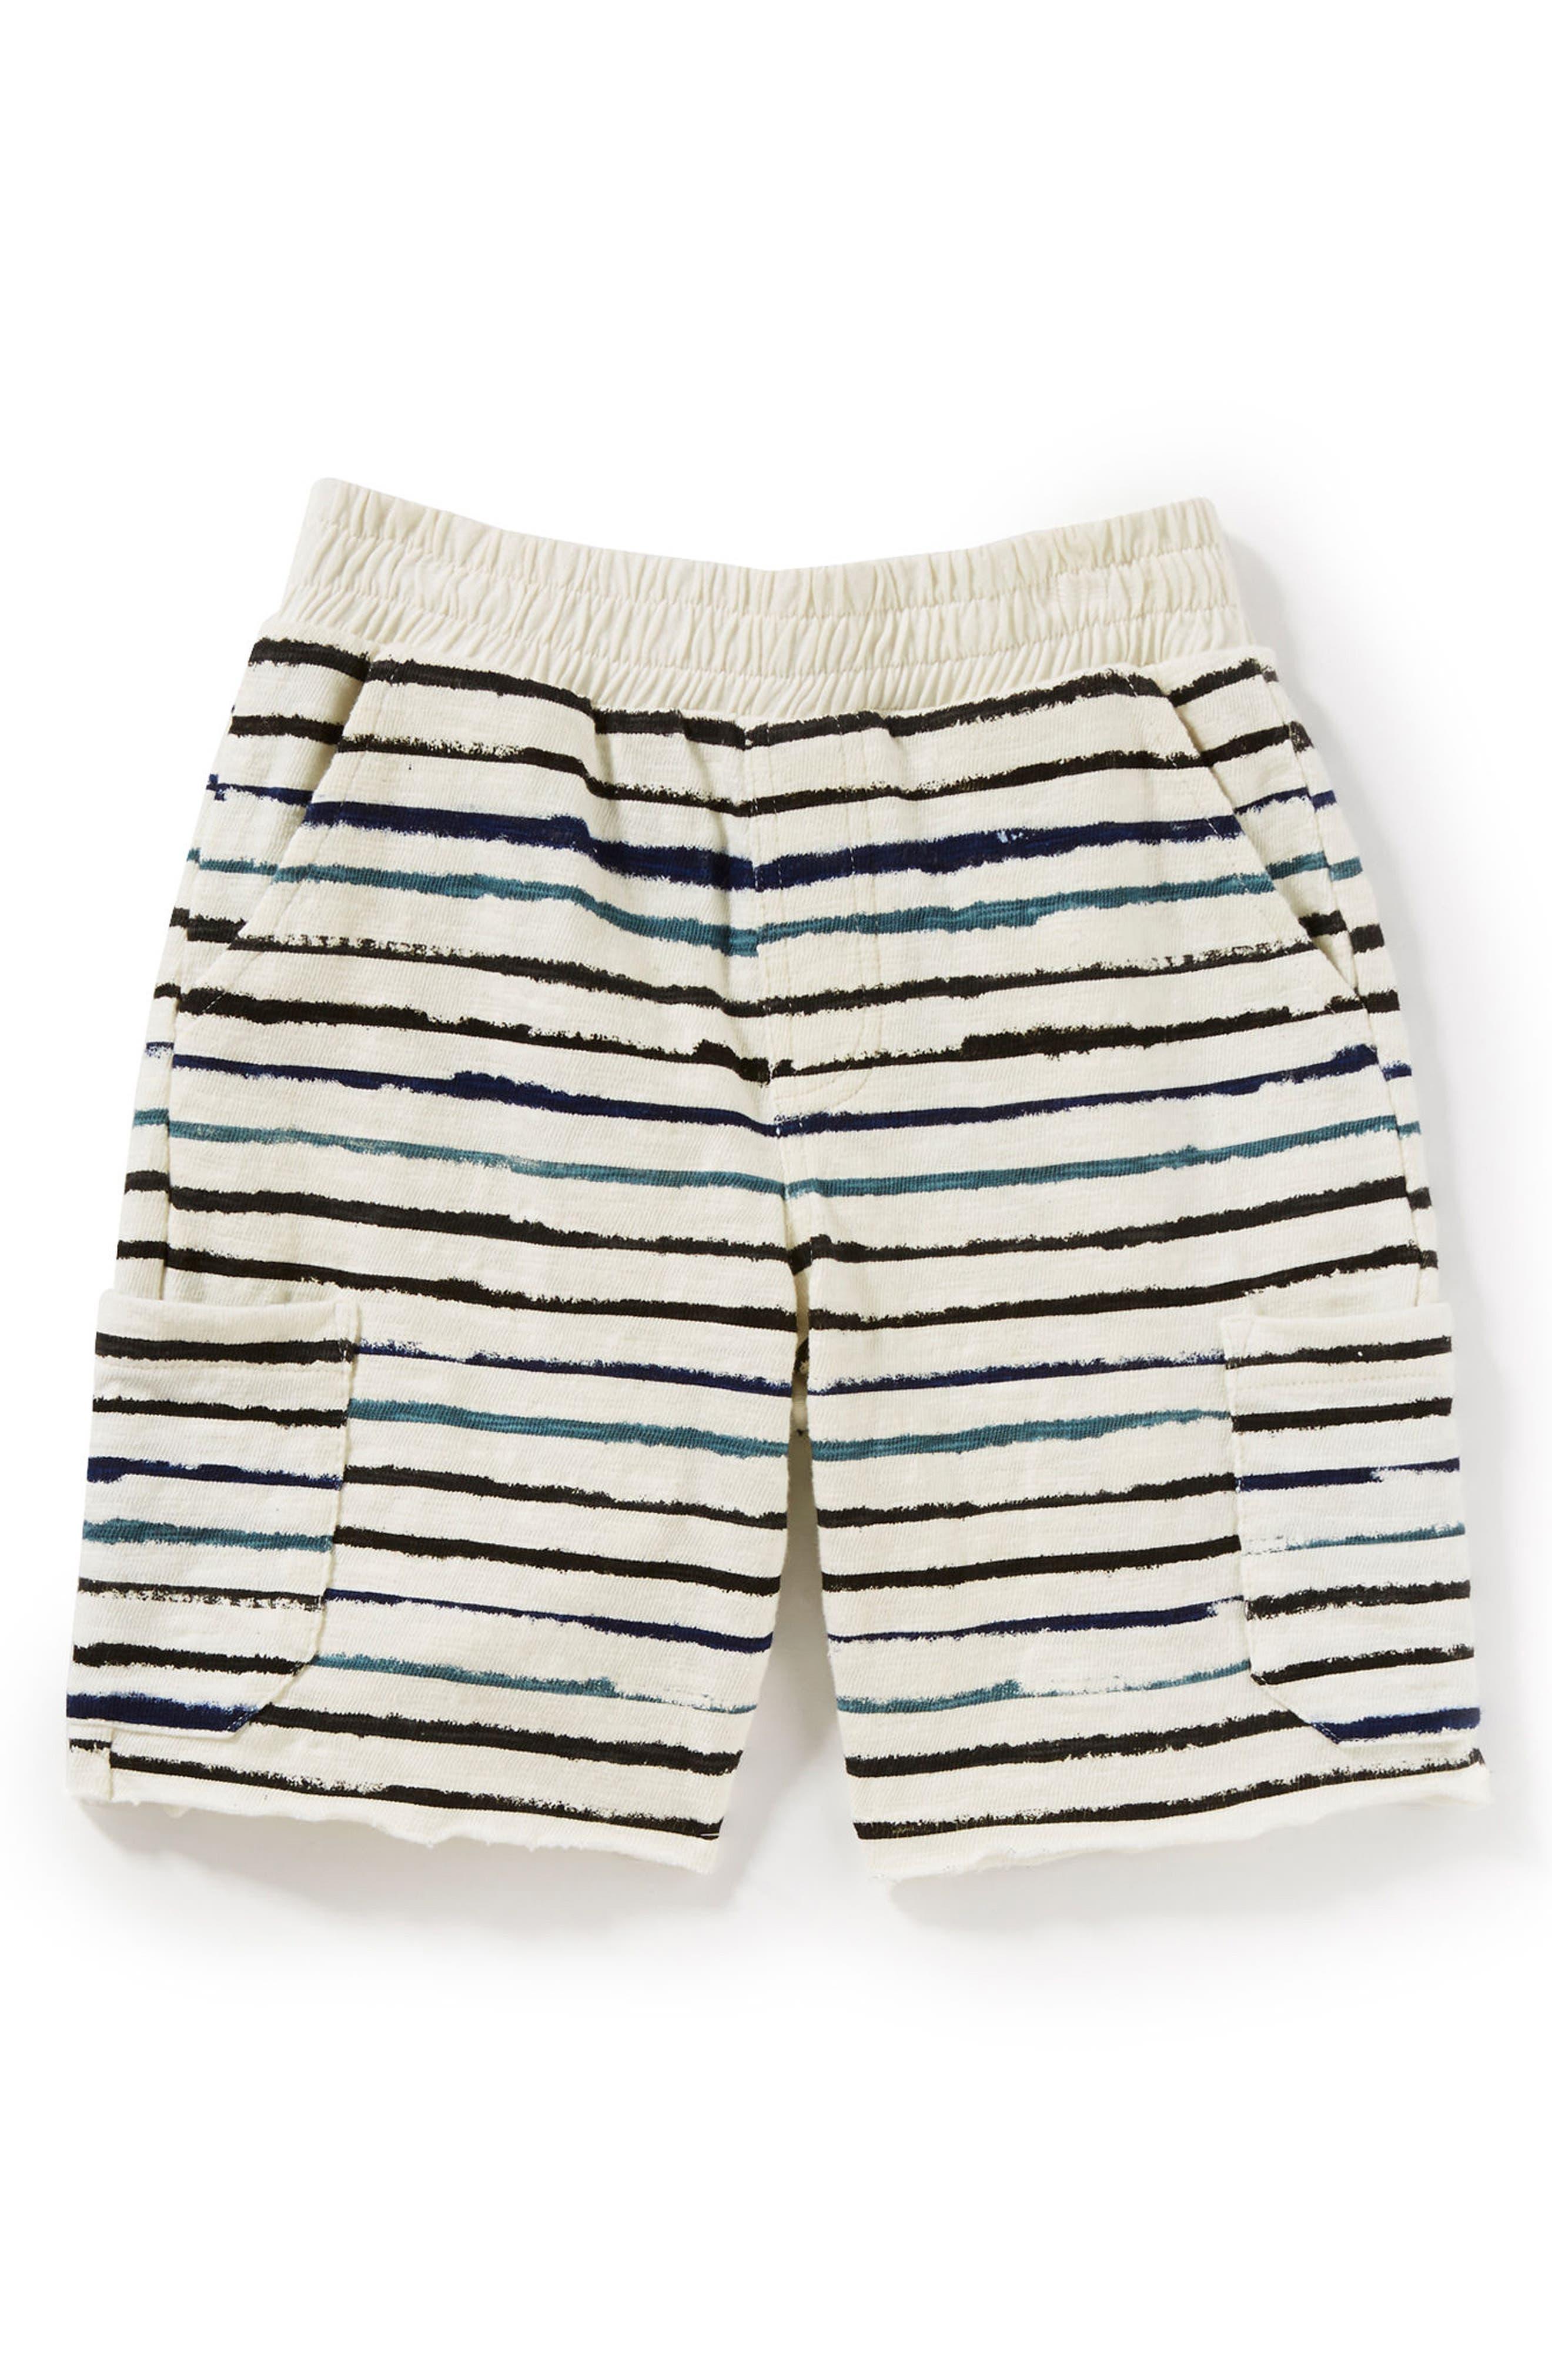 Peek Asher Stripe Shorts (Toddler Boys, Little Boys & Big Boys)